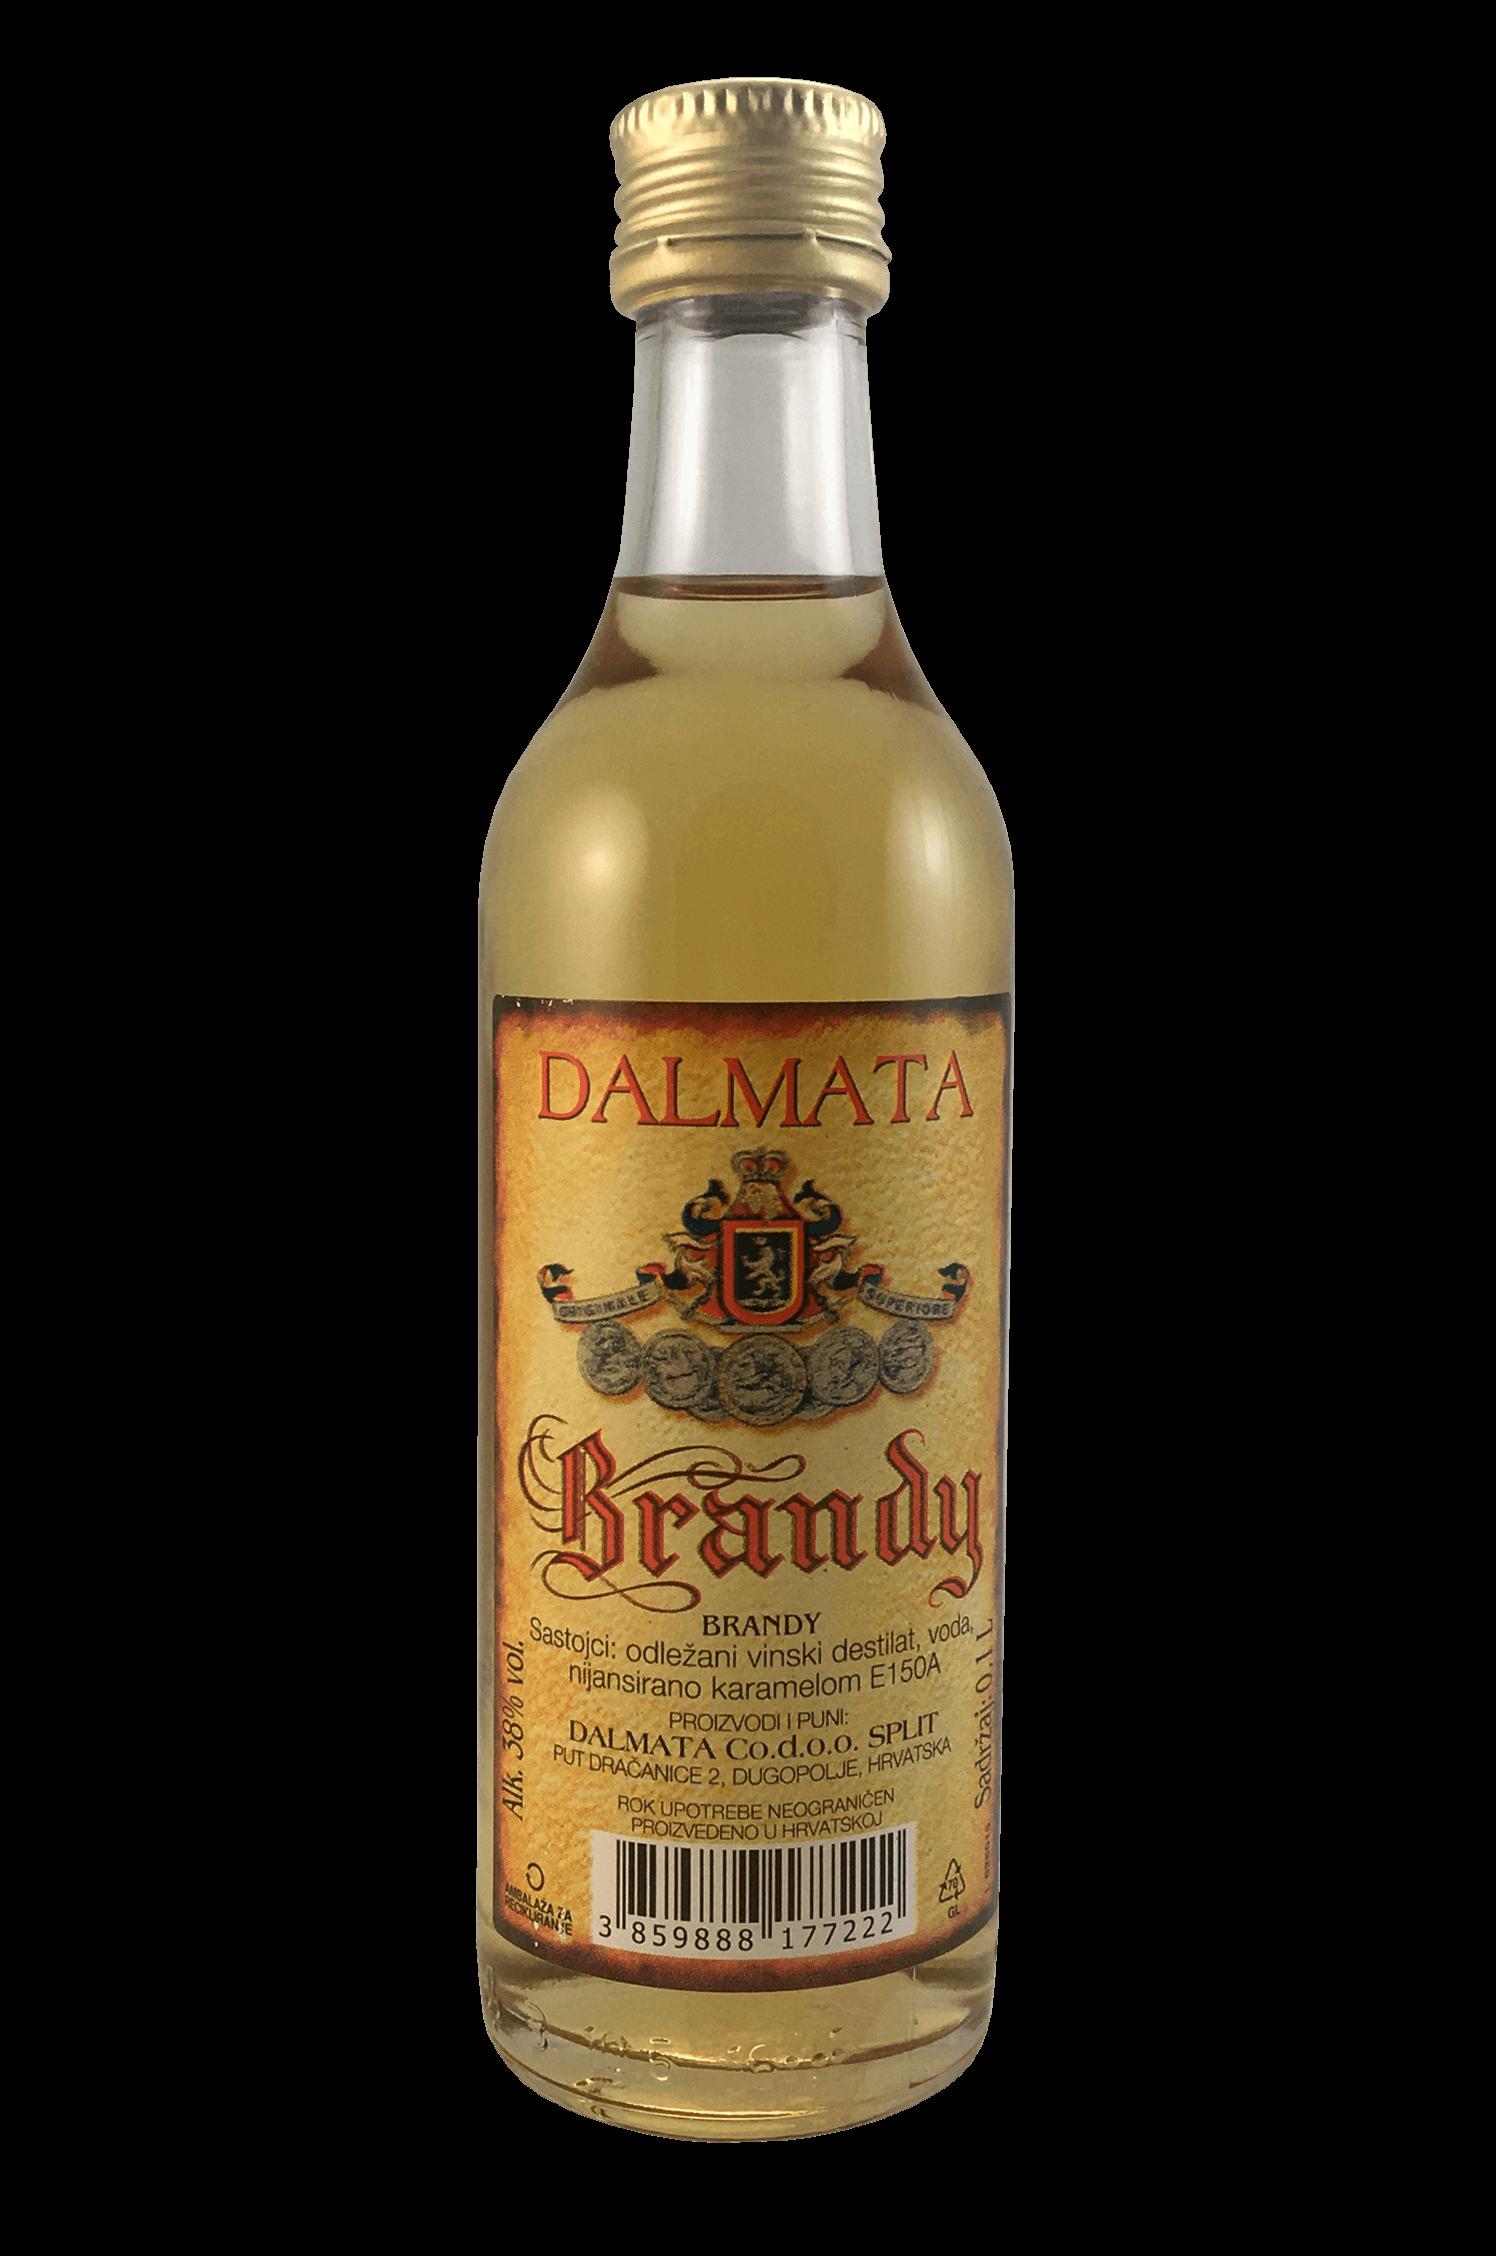 Dalmata Brandy